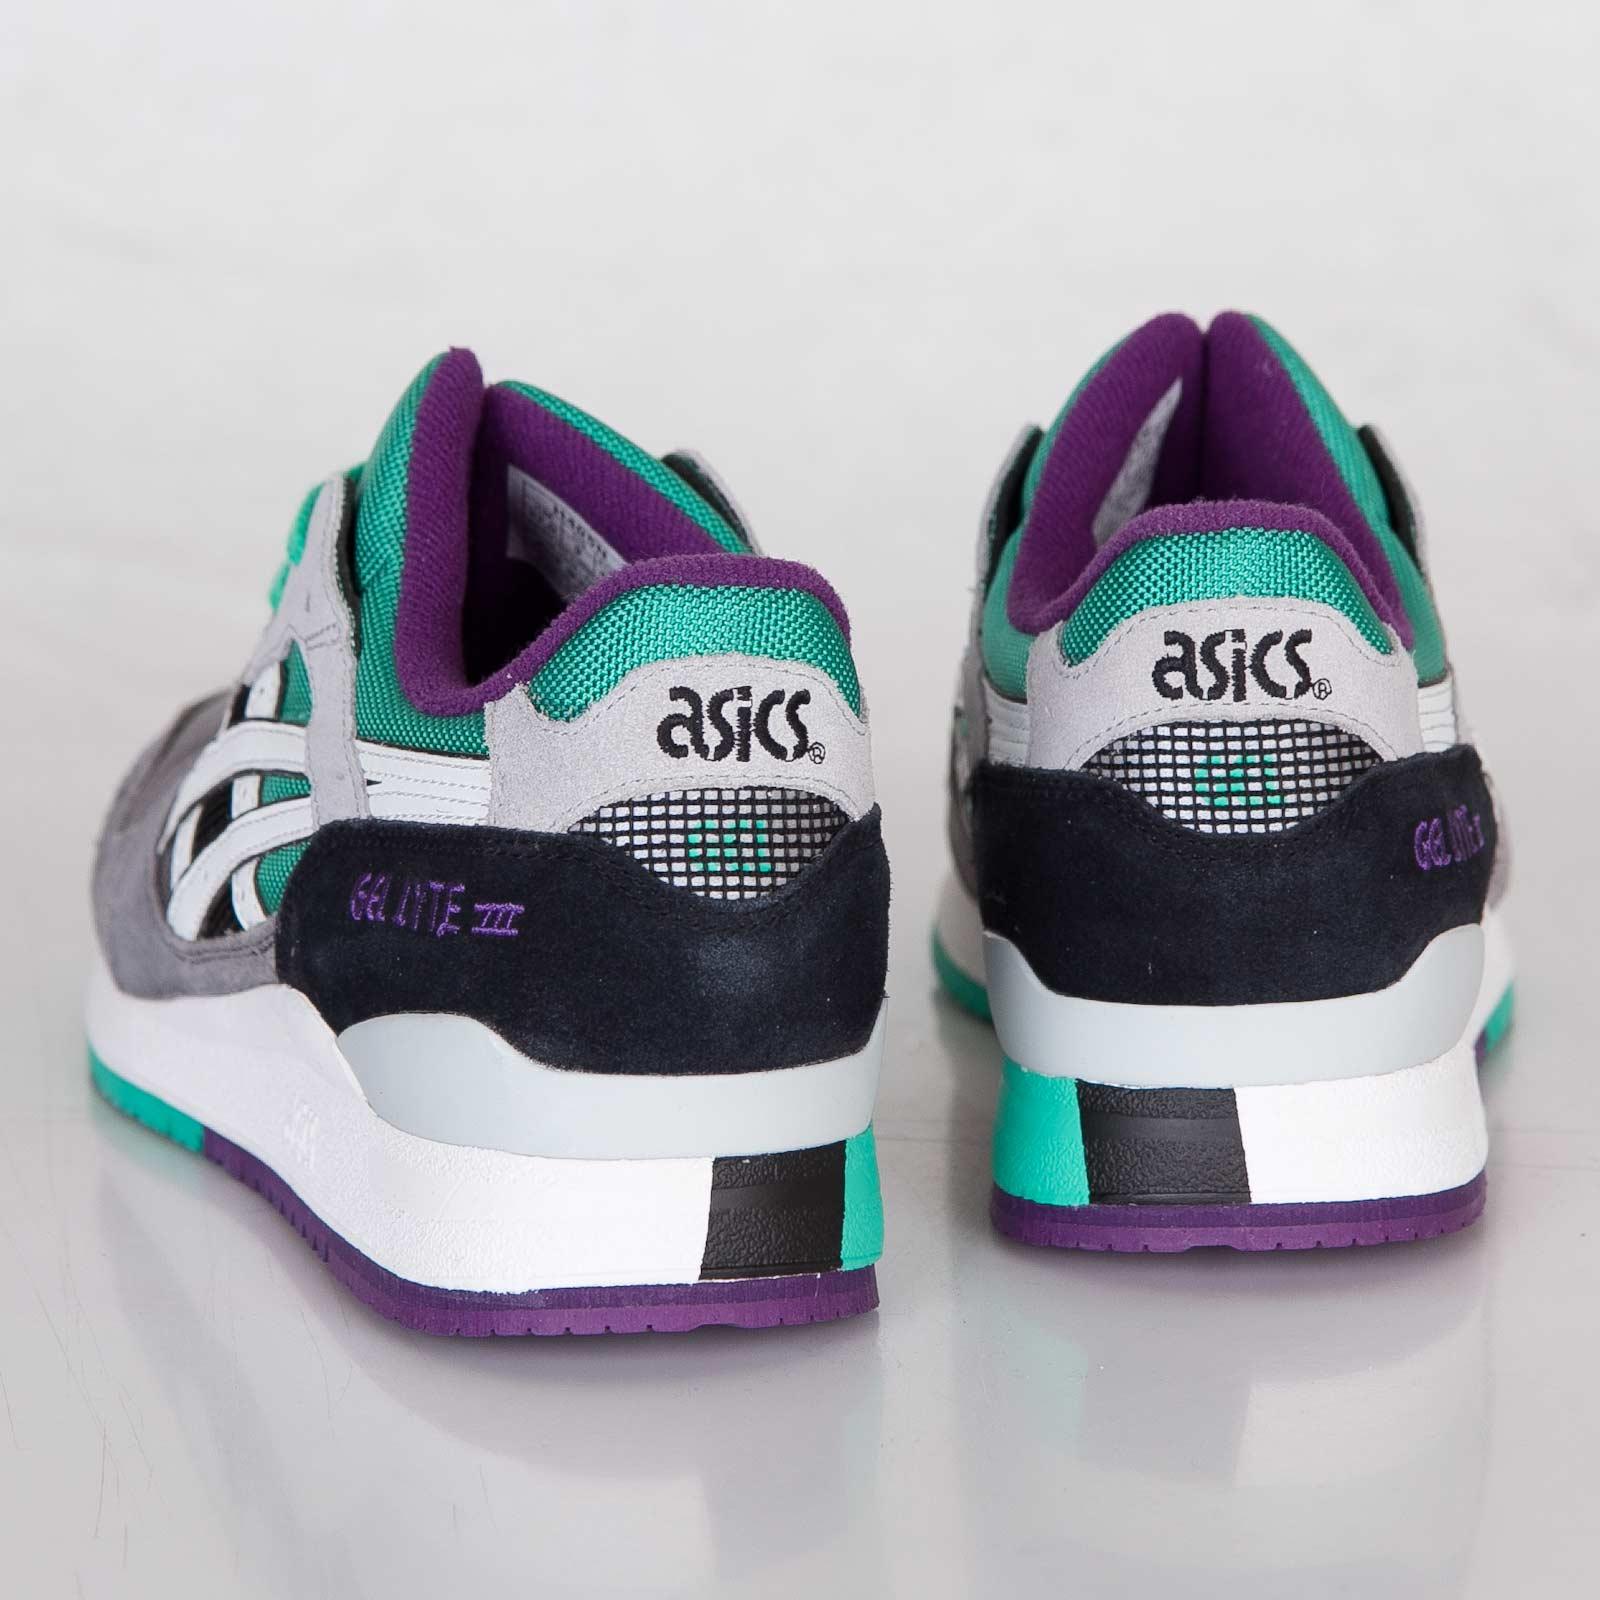 huge selection of 3b375 0e27e ASICS Tiger Gel-Lyte III - H405n-1101 - Sneakersnstuff ...